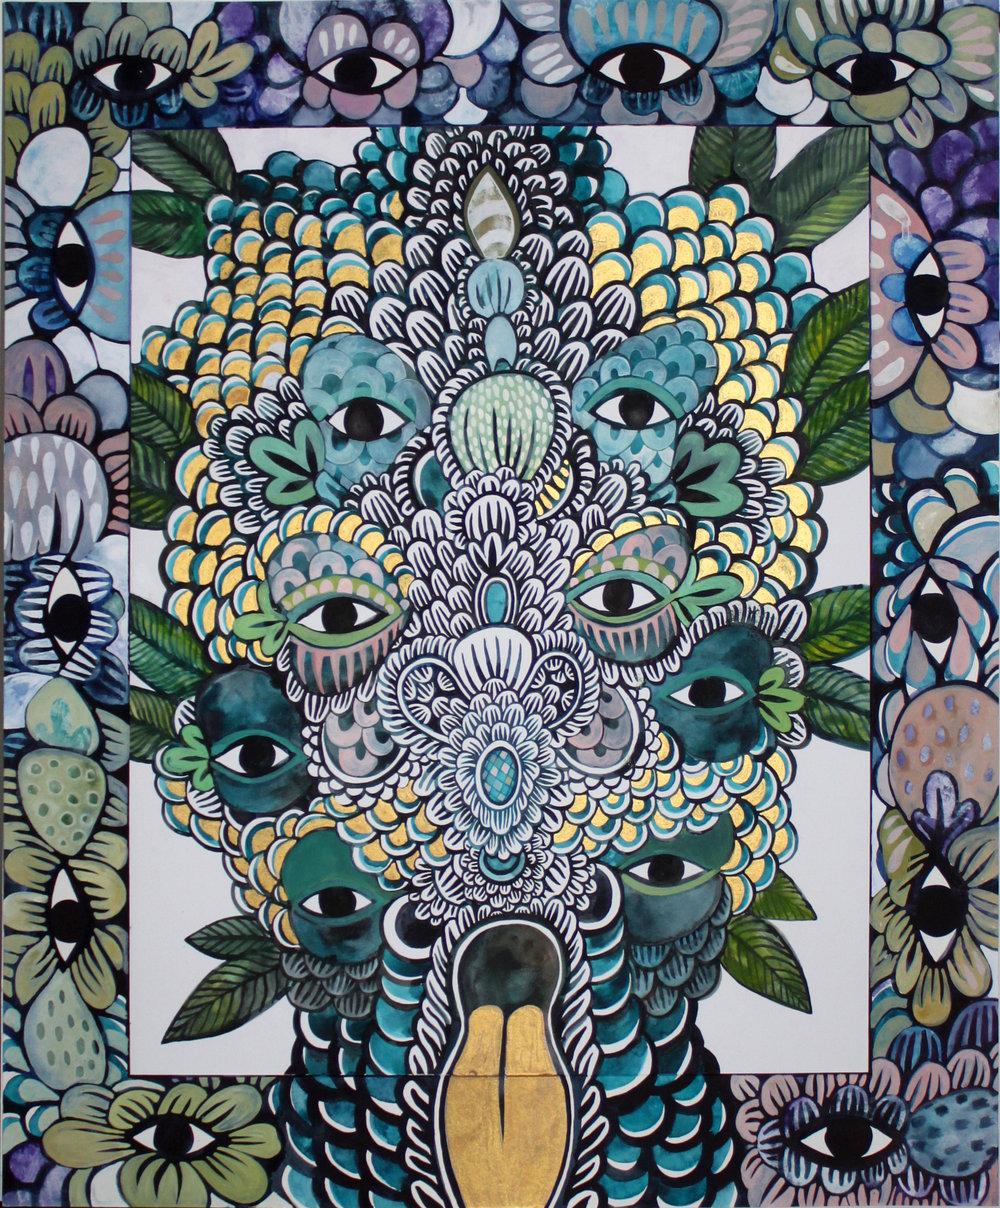 CECILIA FOLGELBERG  MAYHEM CLUSTER #2 , 2019 gouache and watercolour on 100% cotton rag board, framed 87 x 68 cm   I ENQUIRE I